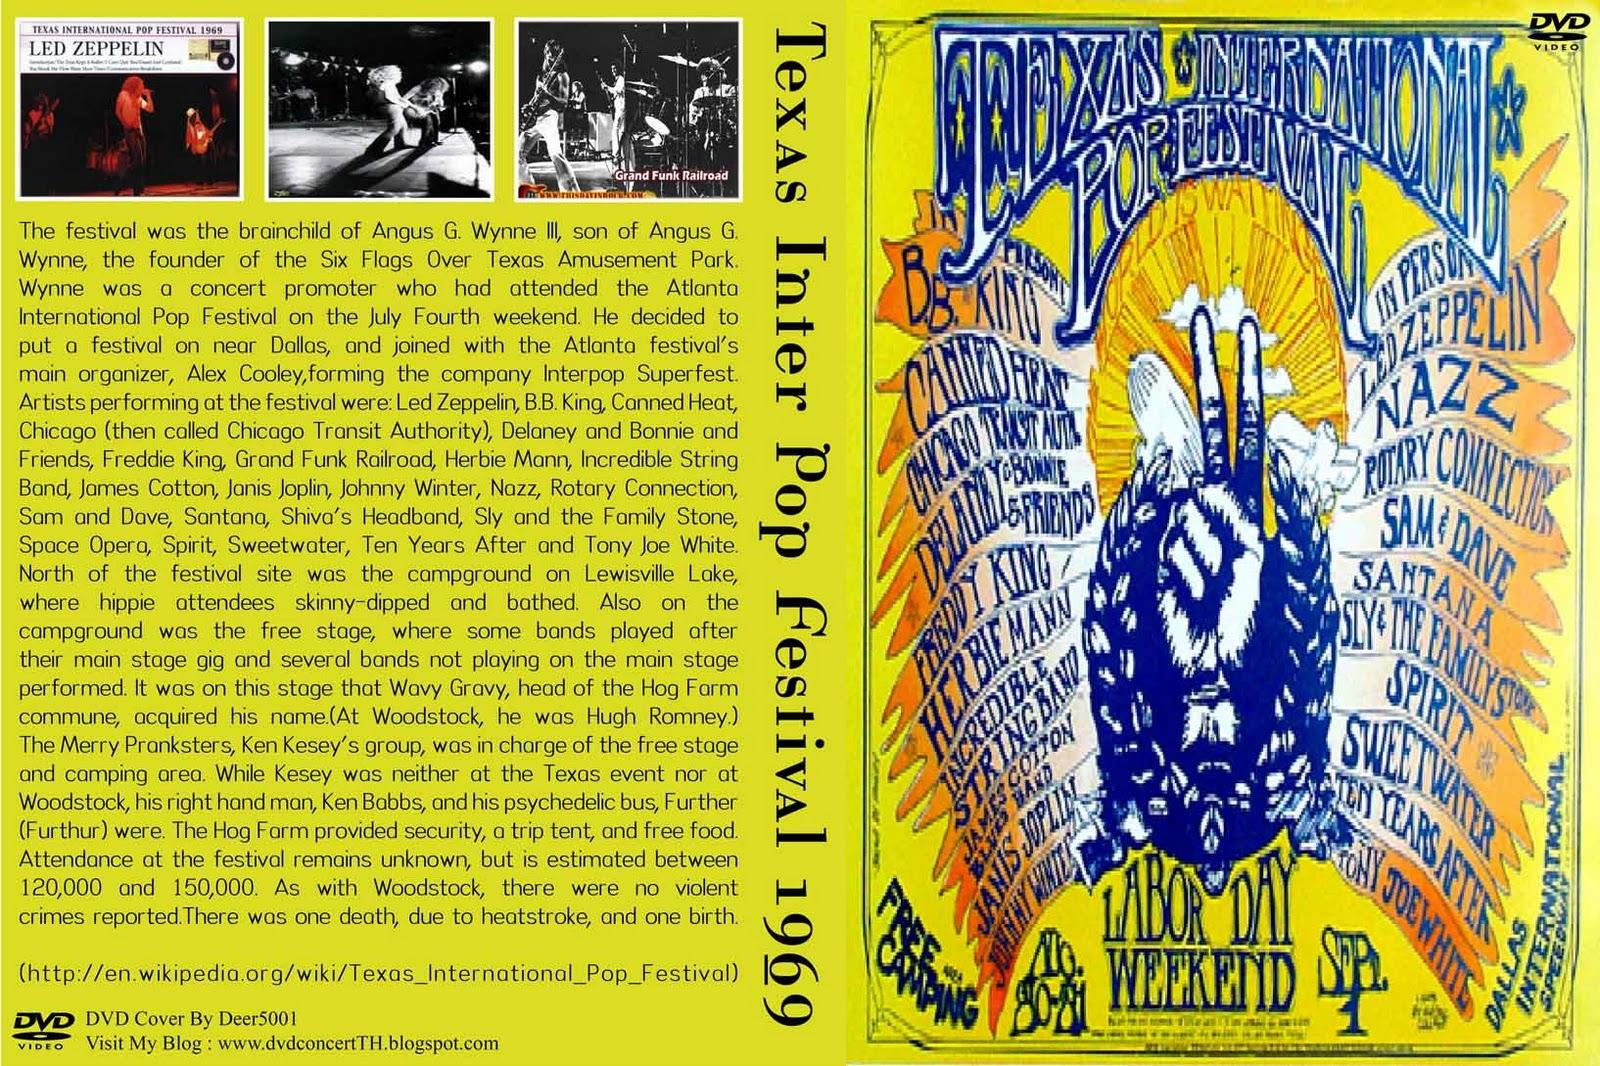 Led Zeppelin Dallas Trampled Under